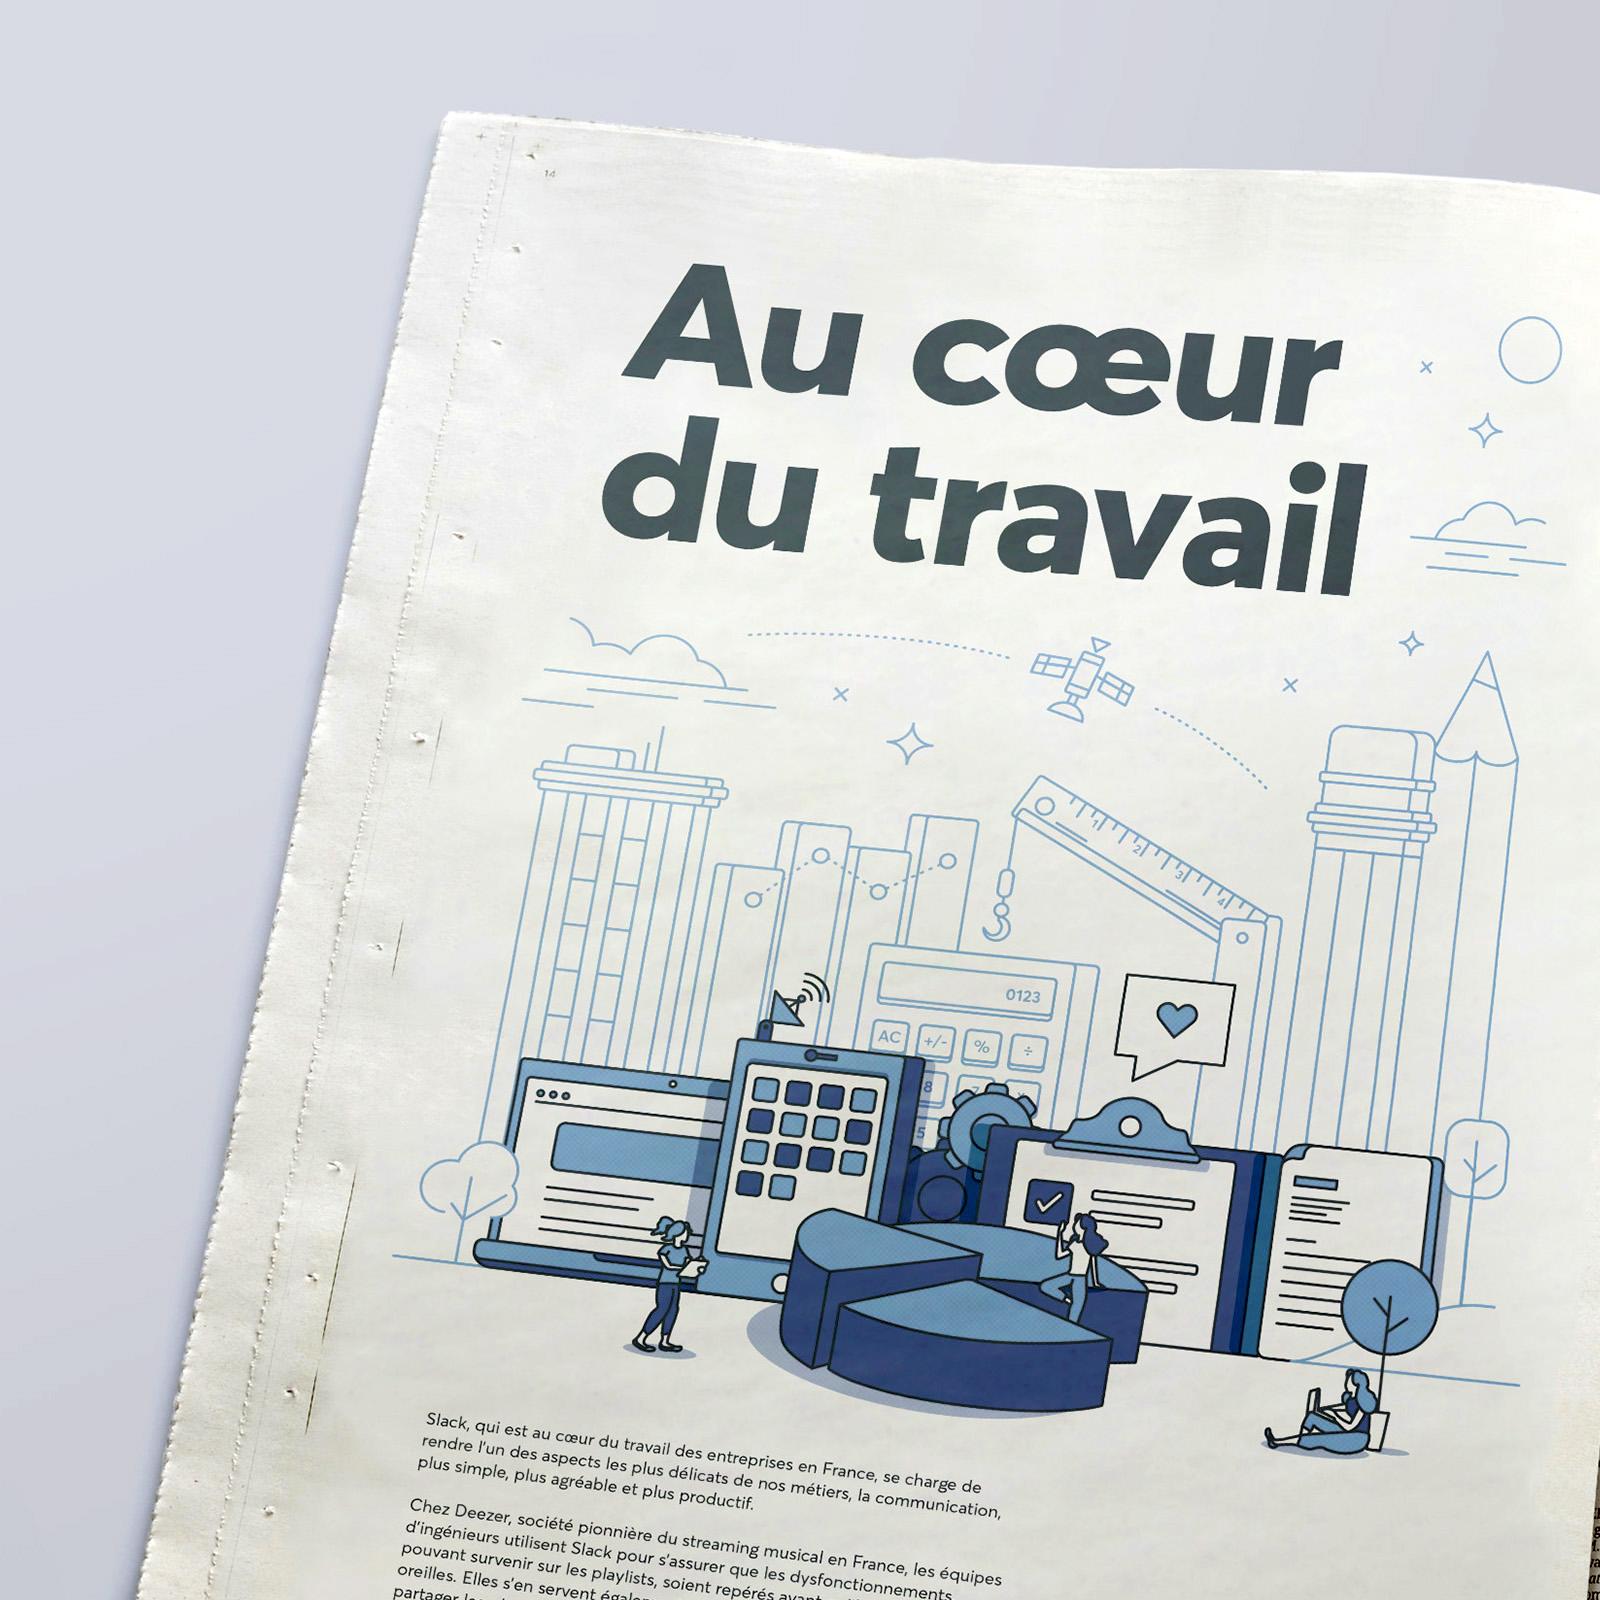 french newspaper slack advertisement